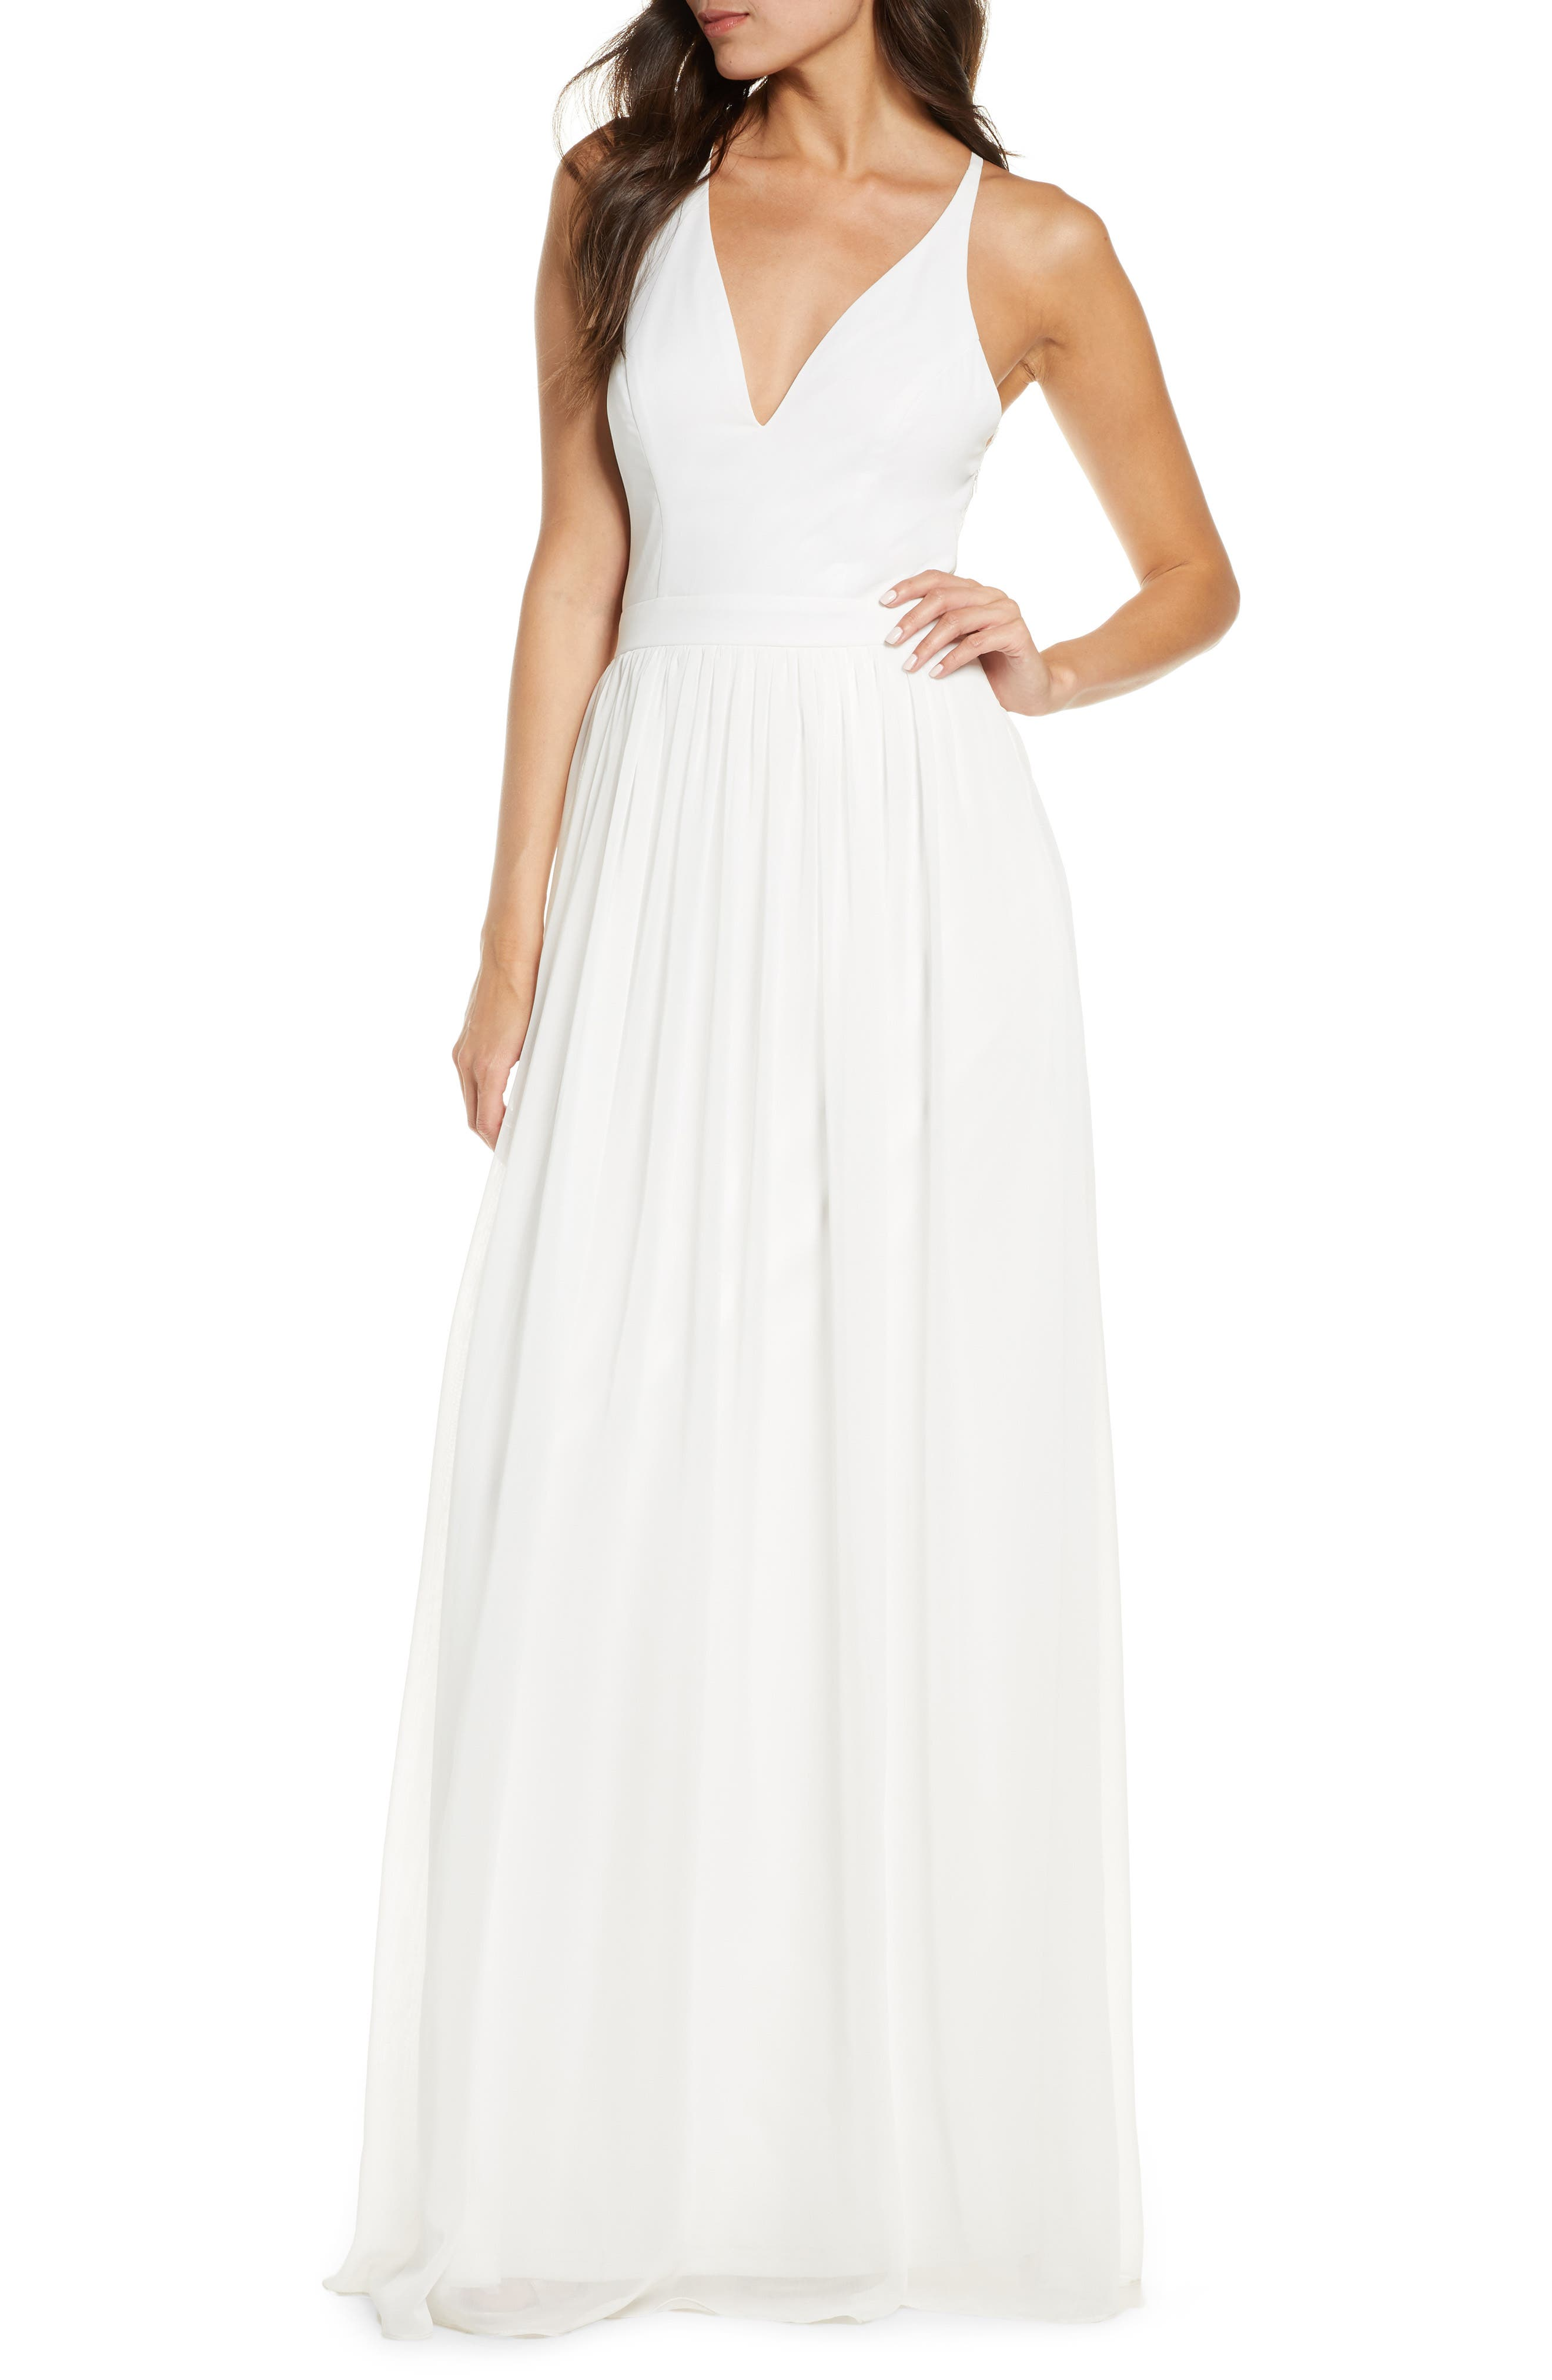 Lulus Everlasting Beauty Lace Back Chiffon Gown